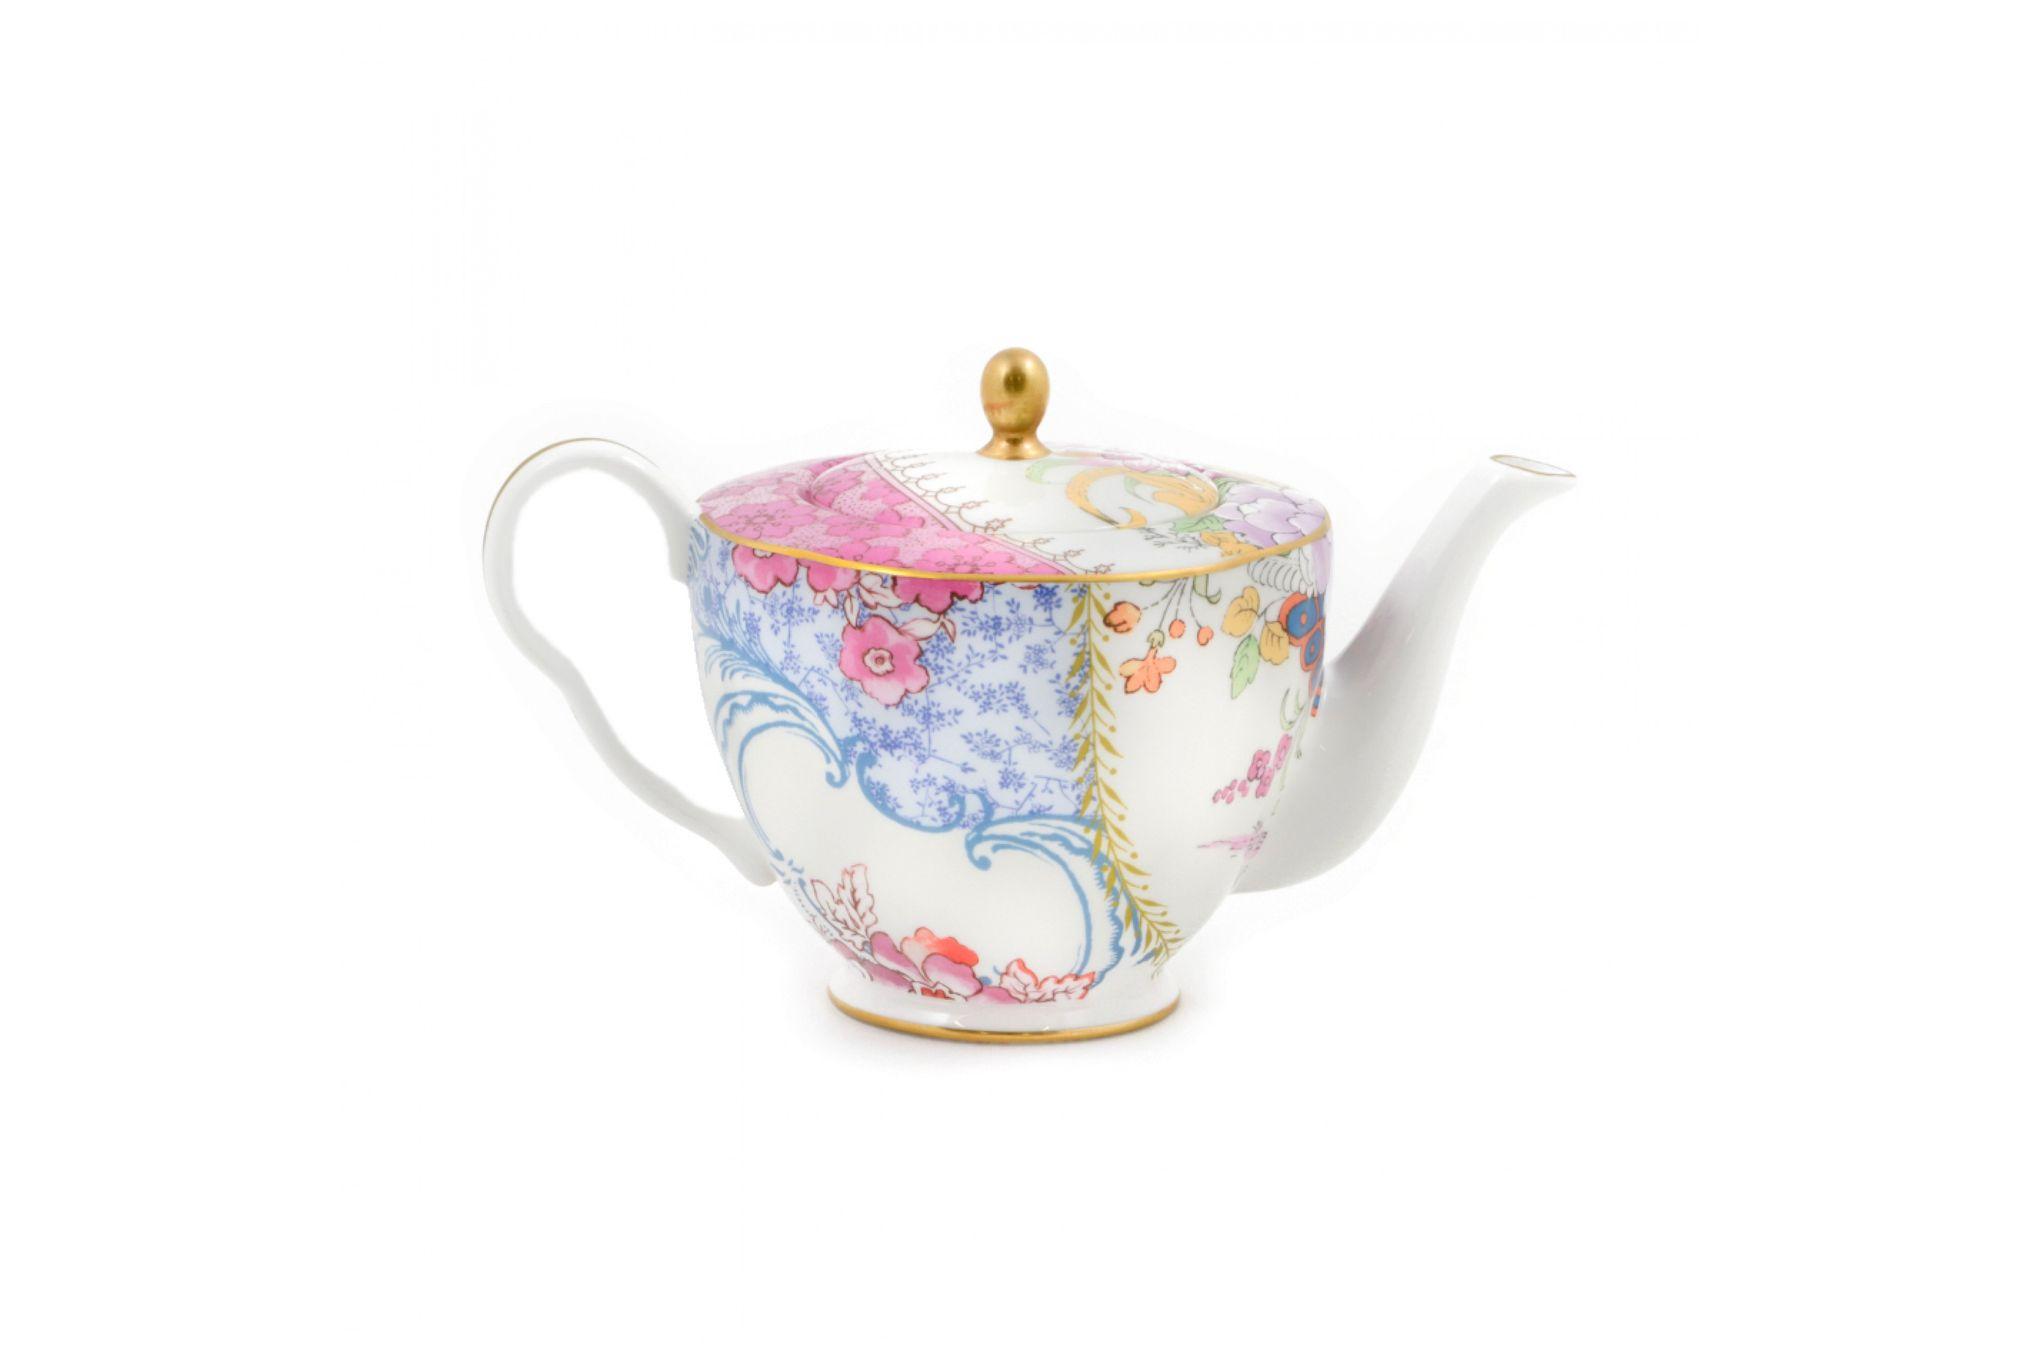 Wedgwood Butterfly Bloom Teapot 0.37l thumb 2